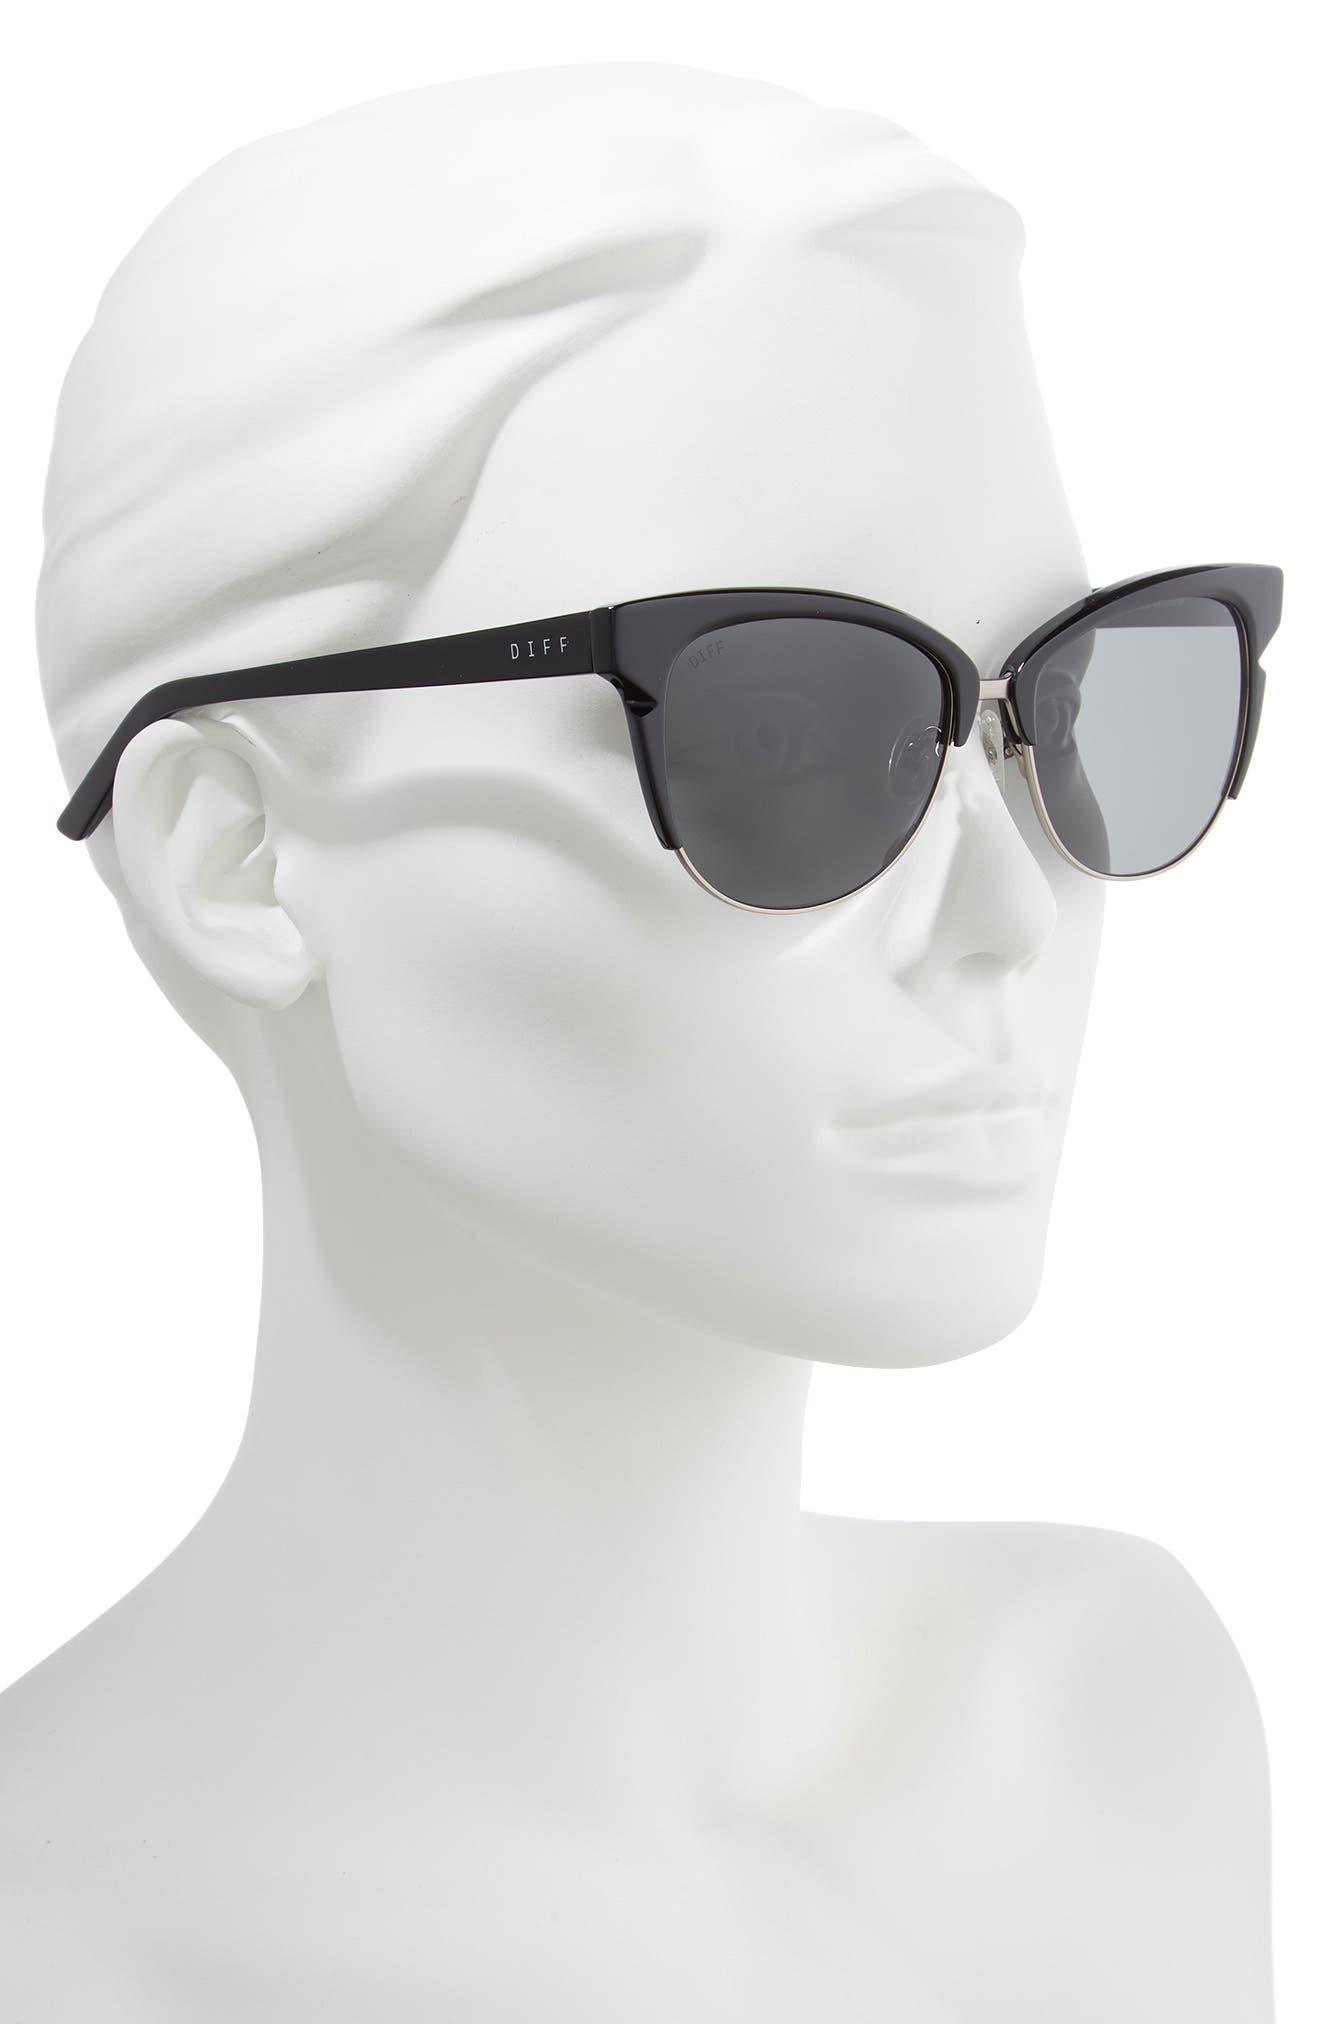 Ivy 56mm Polarized Cat Eye Sunglasses,                             Main thumbnail 1, color,                             BLACK/ DARK SMOKE